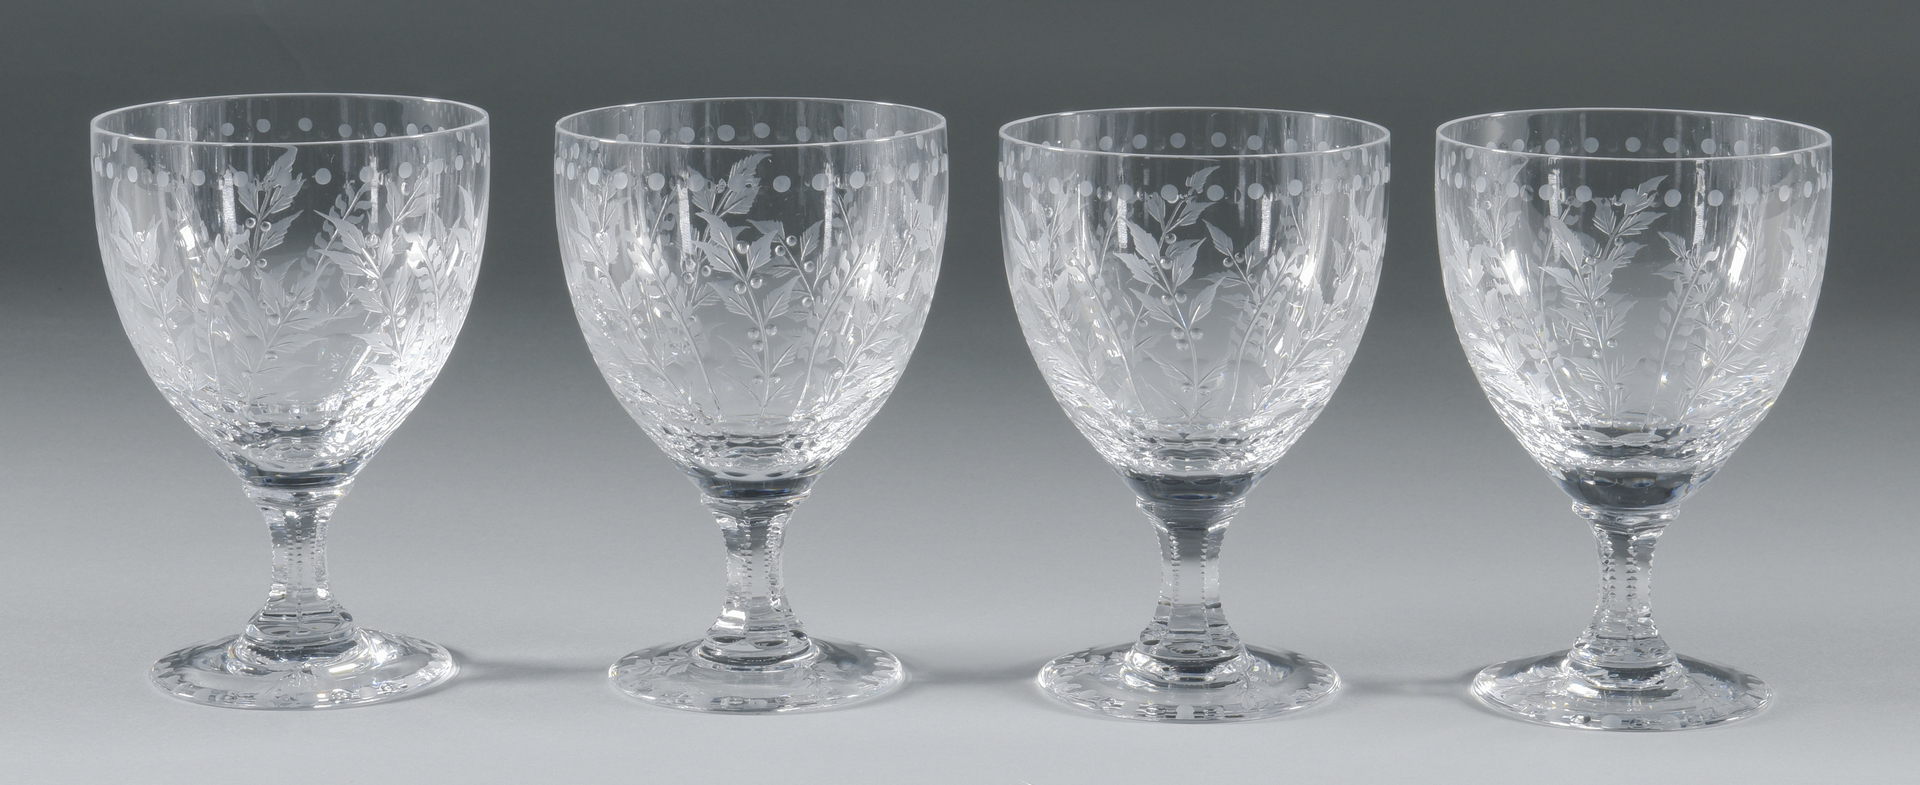 Lot 693 William Yeoward Quot Fern Quot Goblets Wine Glasses